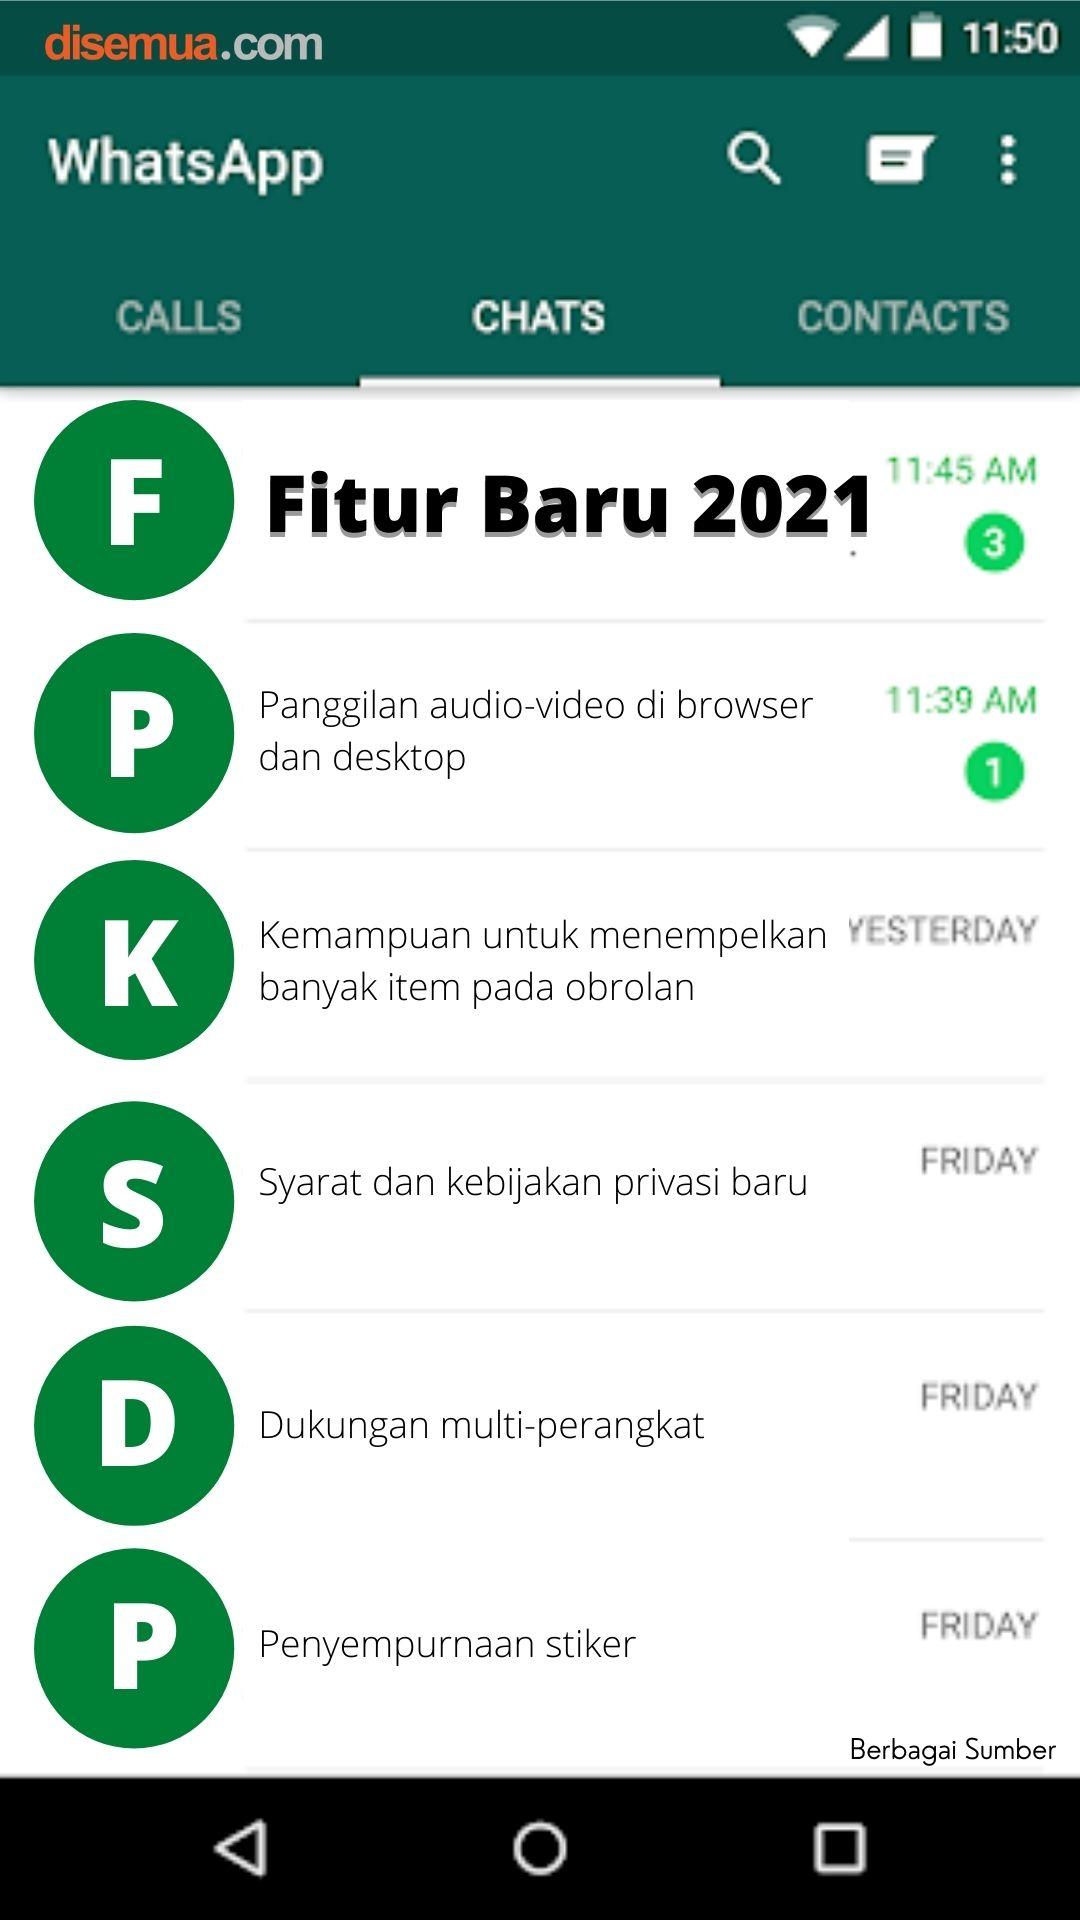 Fitur Baru WhatsApp 2021